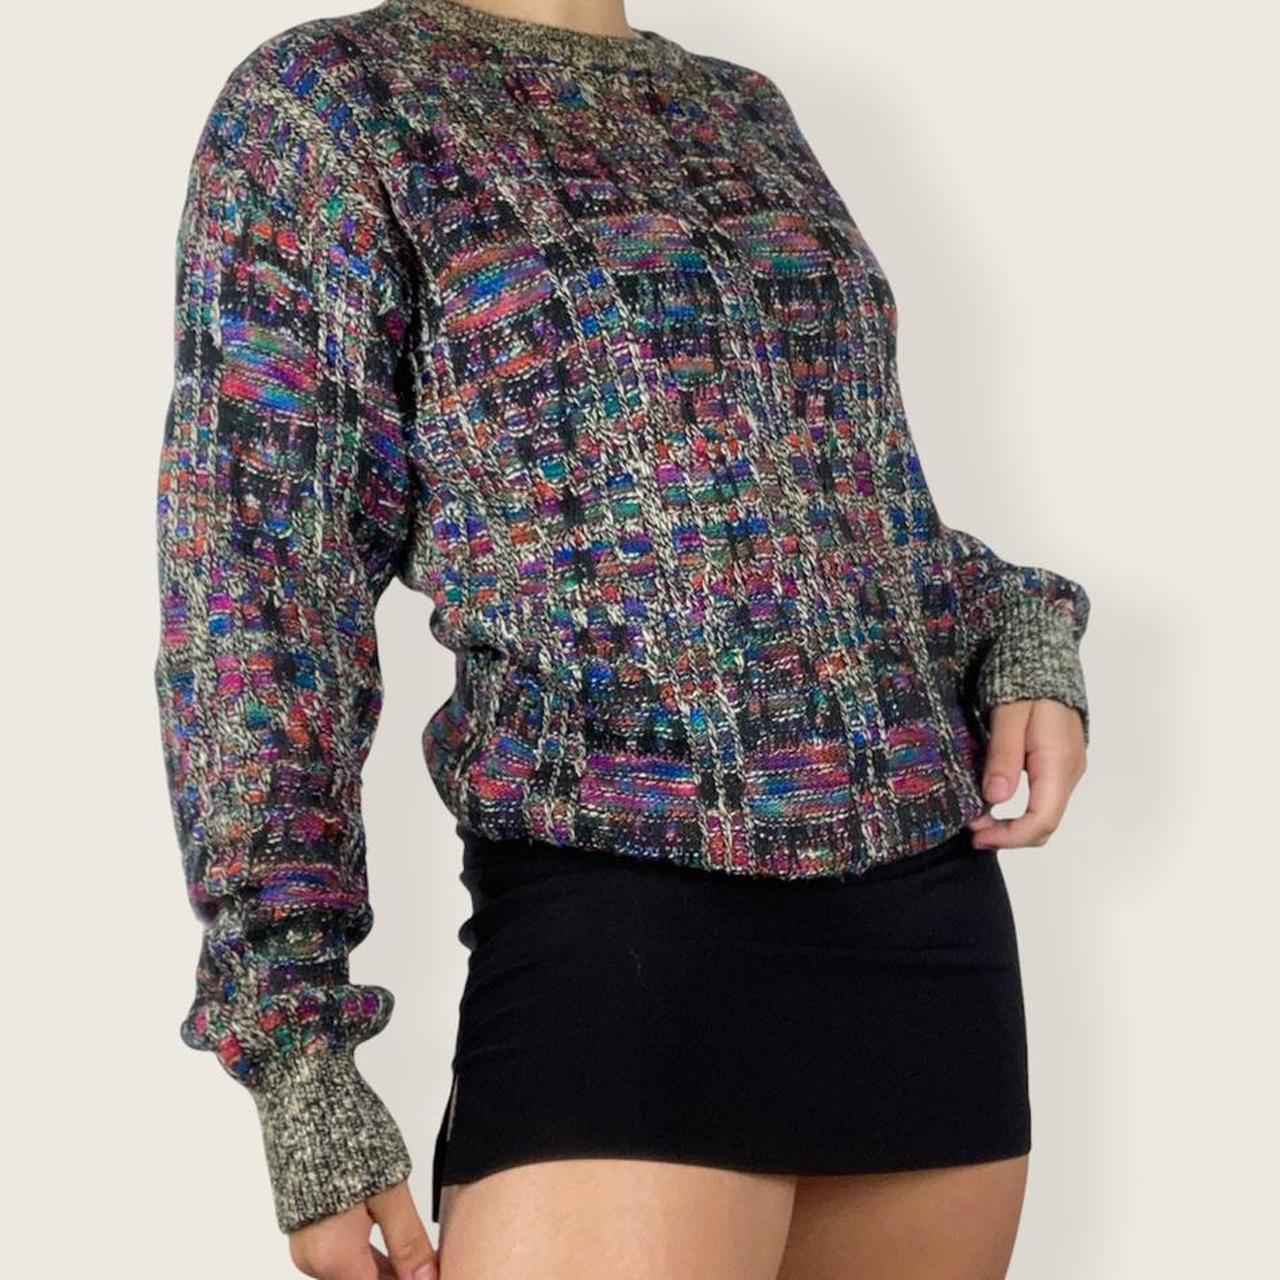 Product Image 1 - Chunky knit sweater✨  Beautiful colorful knit